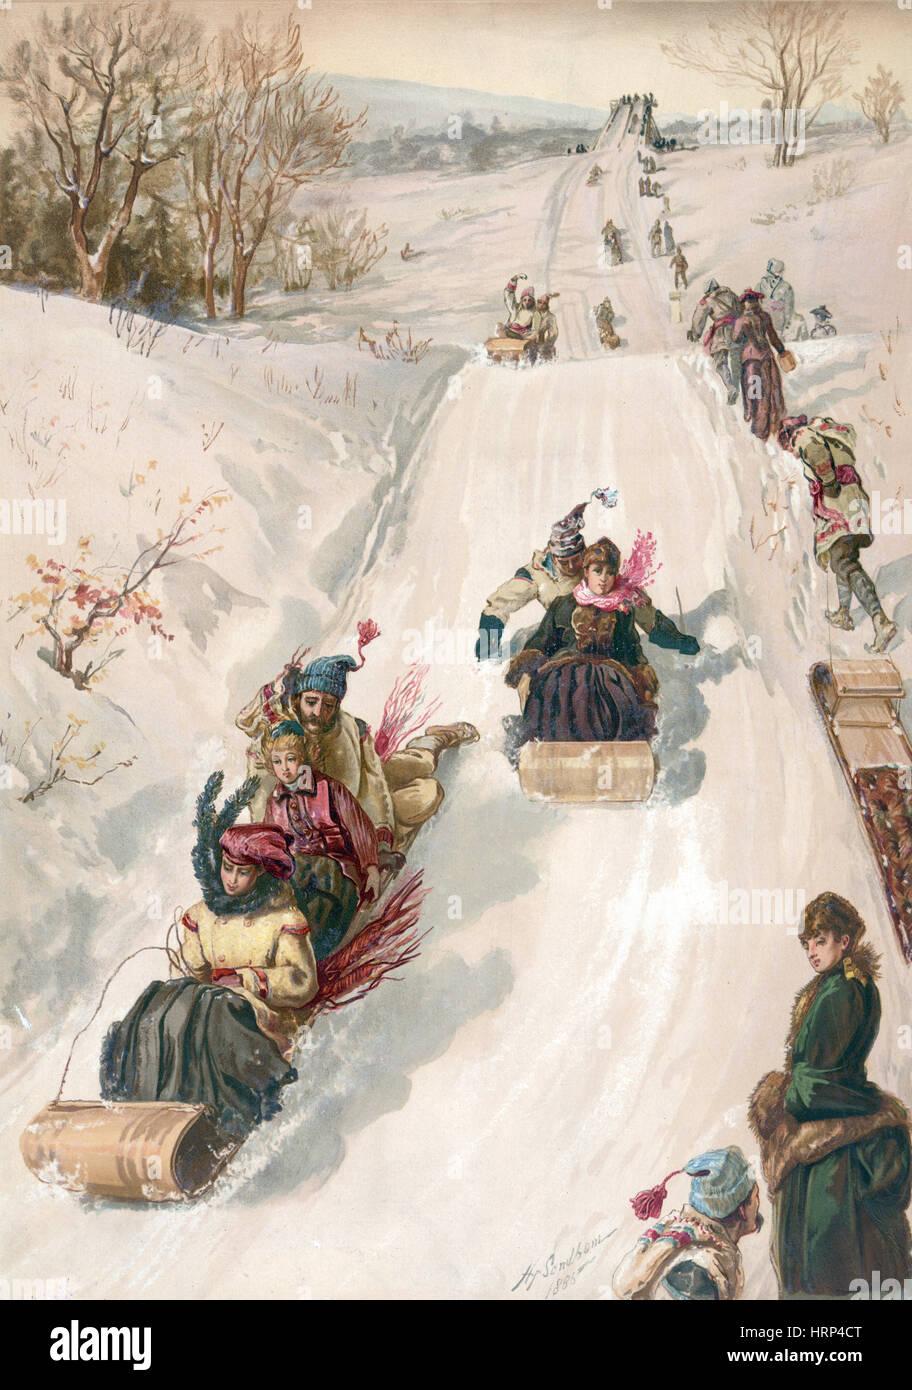 Season's Greetings, Happy Holidays, 1886 - Stock Image